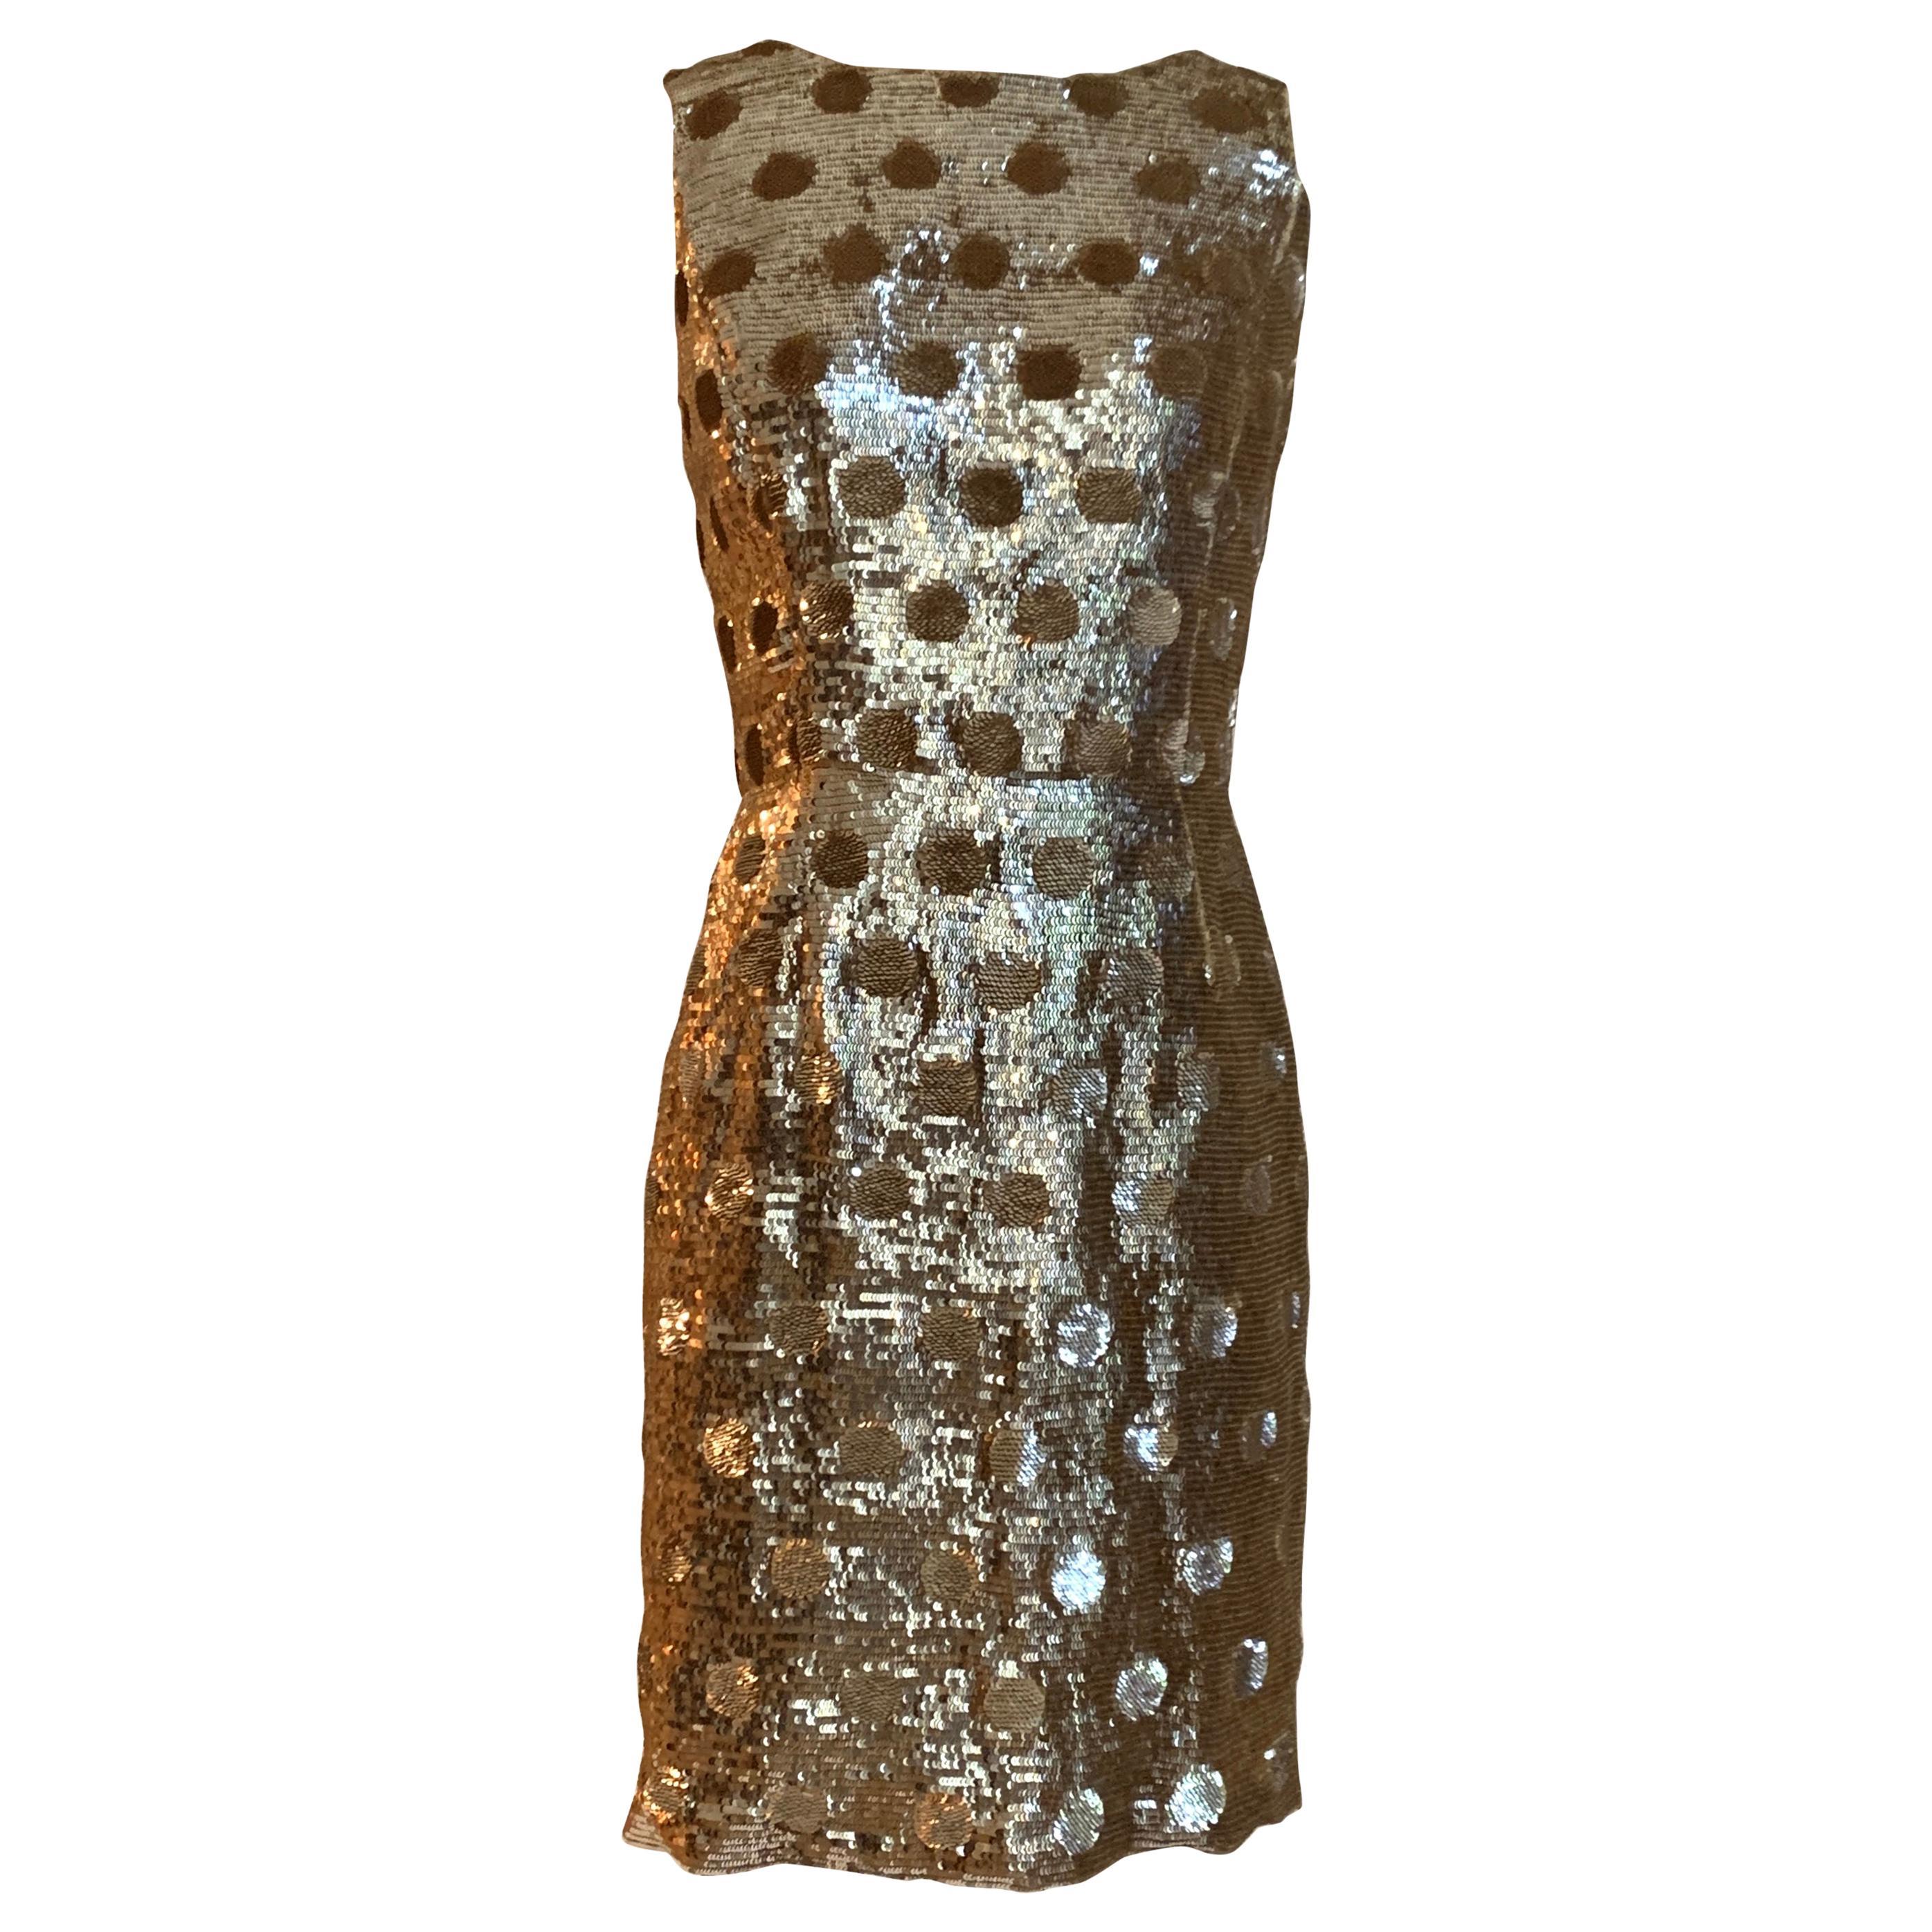 Oscar de la Renta Gold Sequin Polka Dot Sleeveless Cocktail Dress